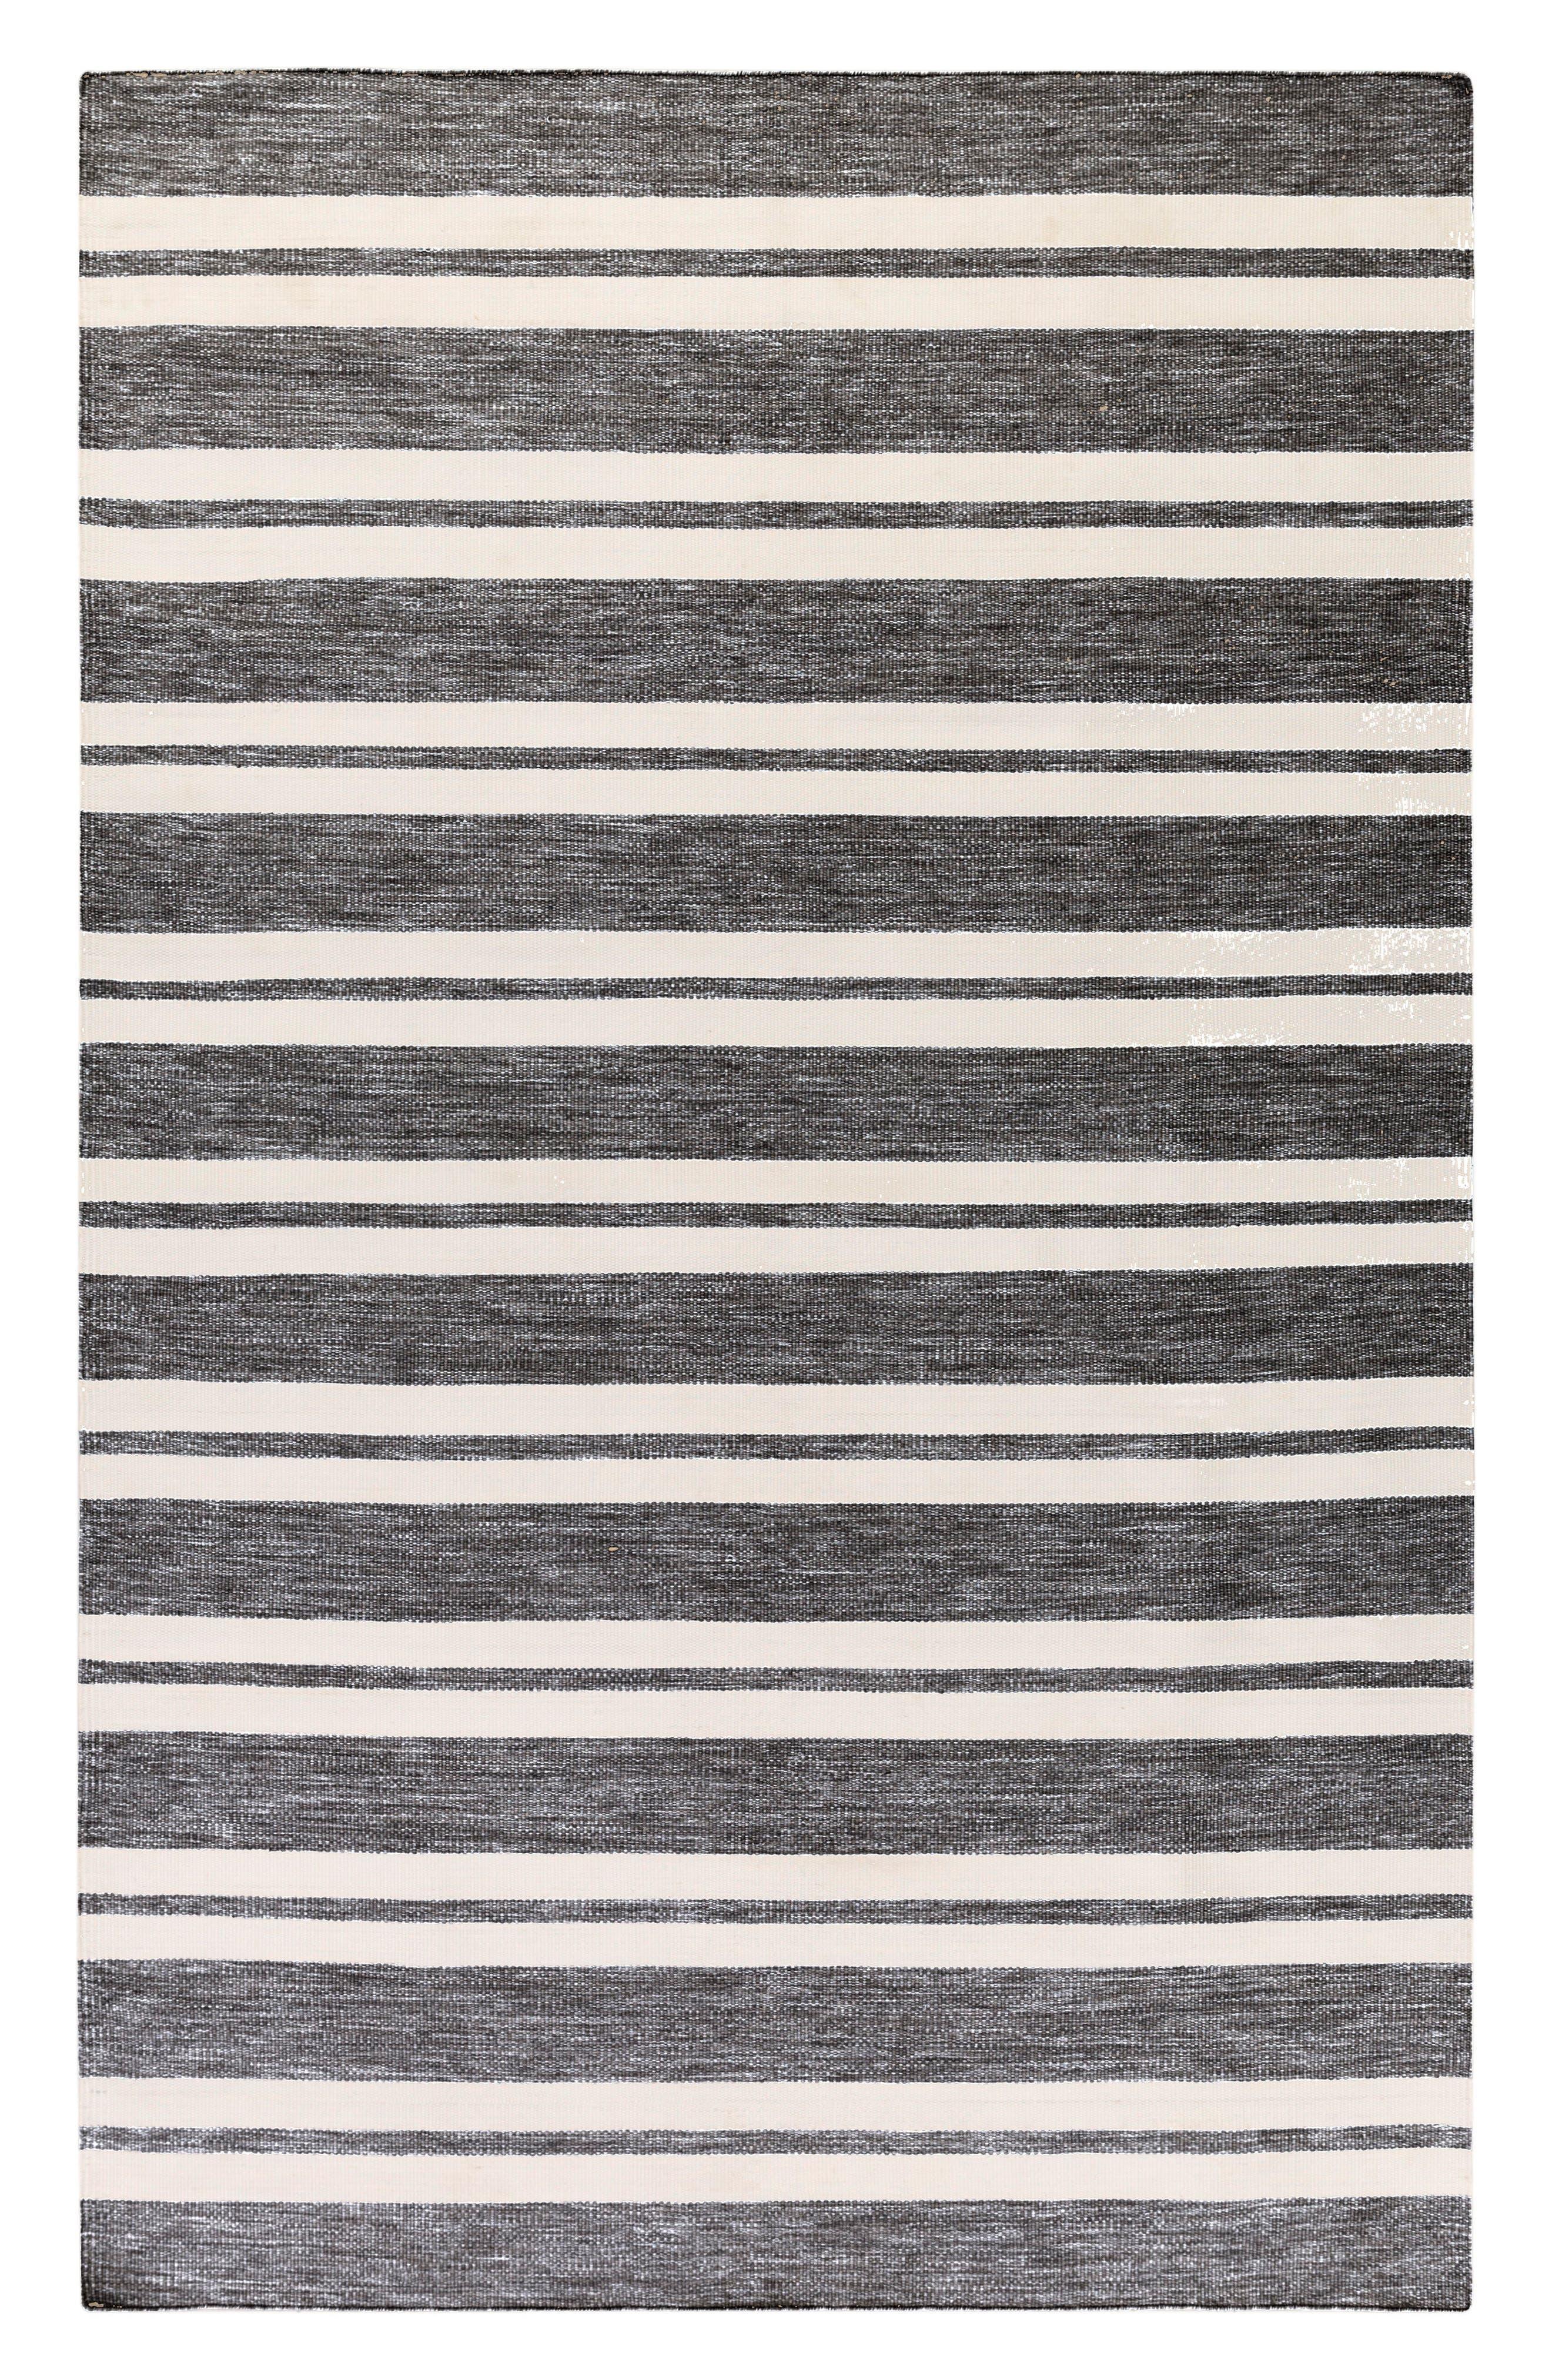 Everett Area Rug,                         Main,                         color, Gray